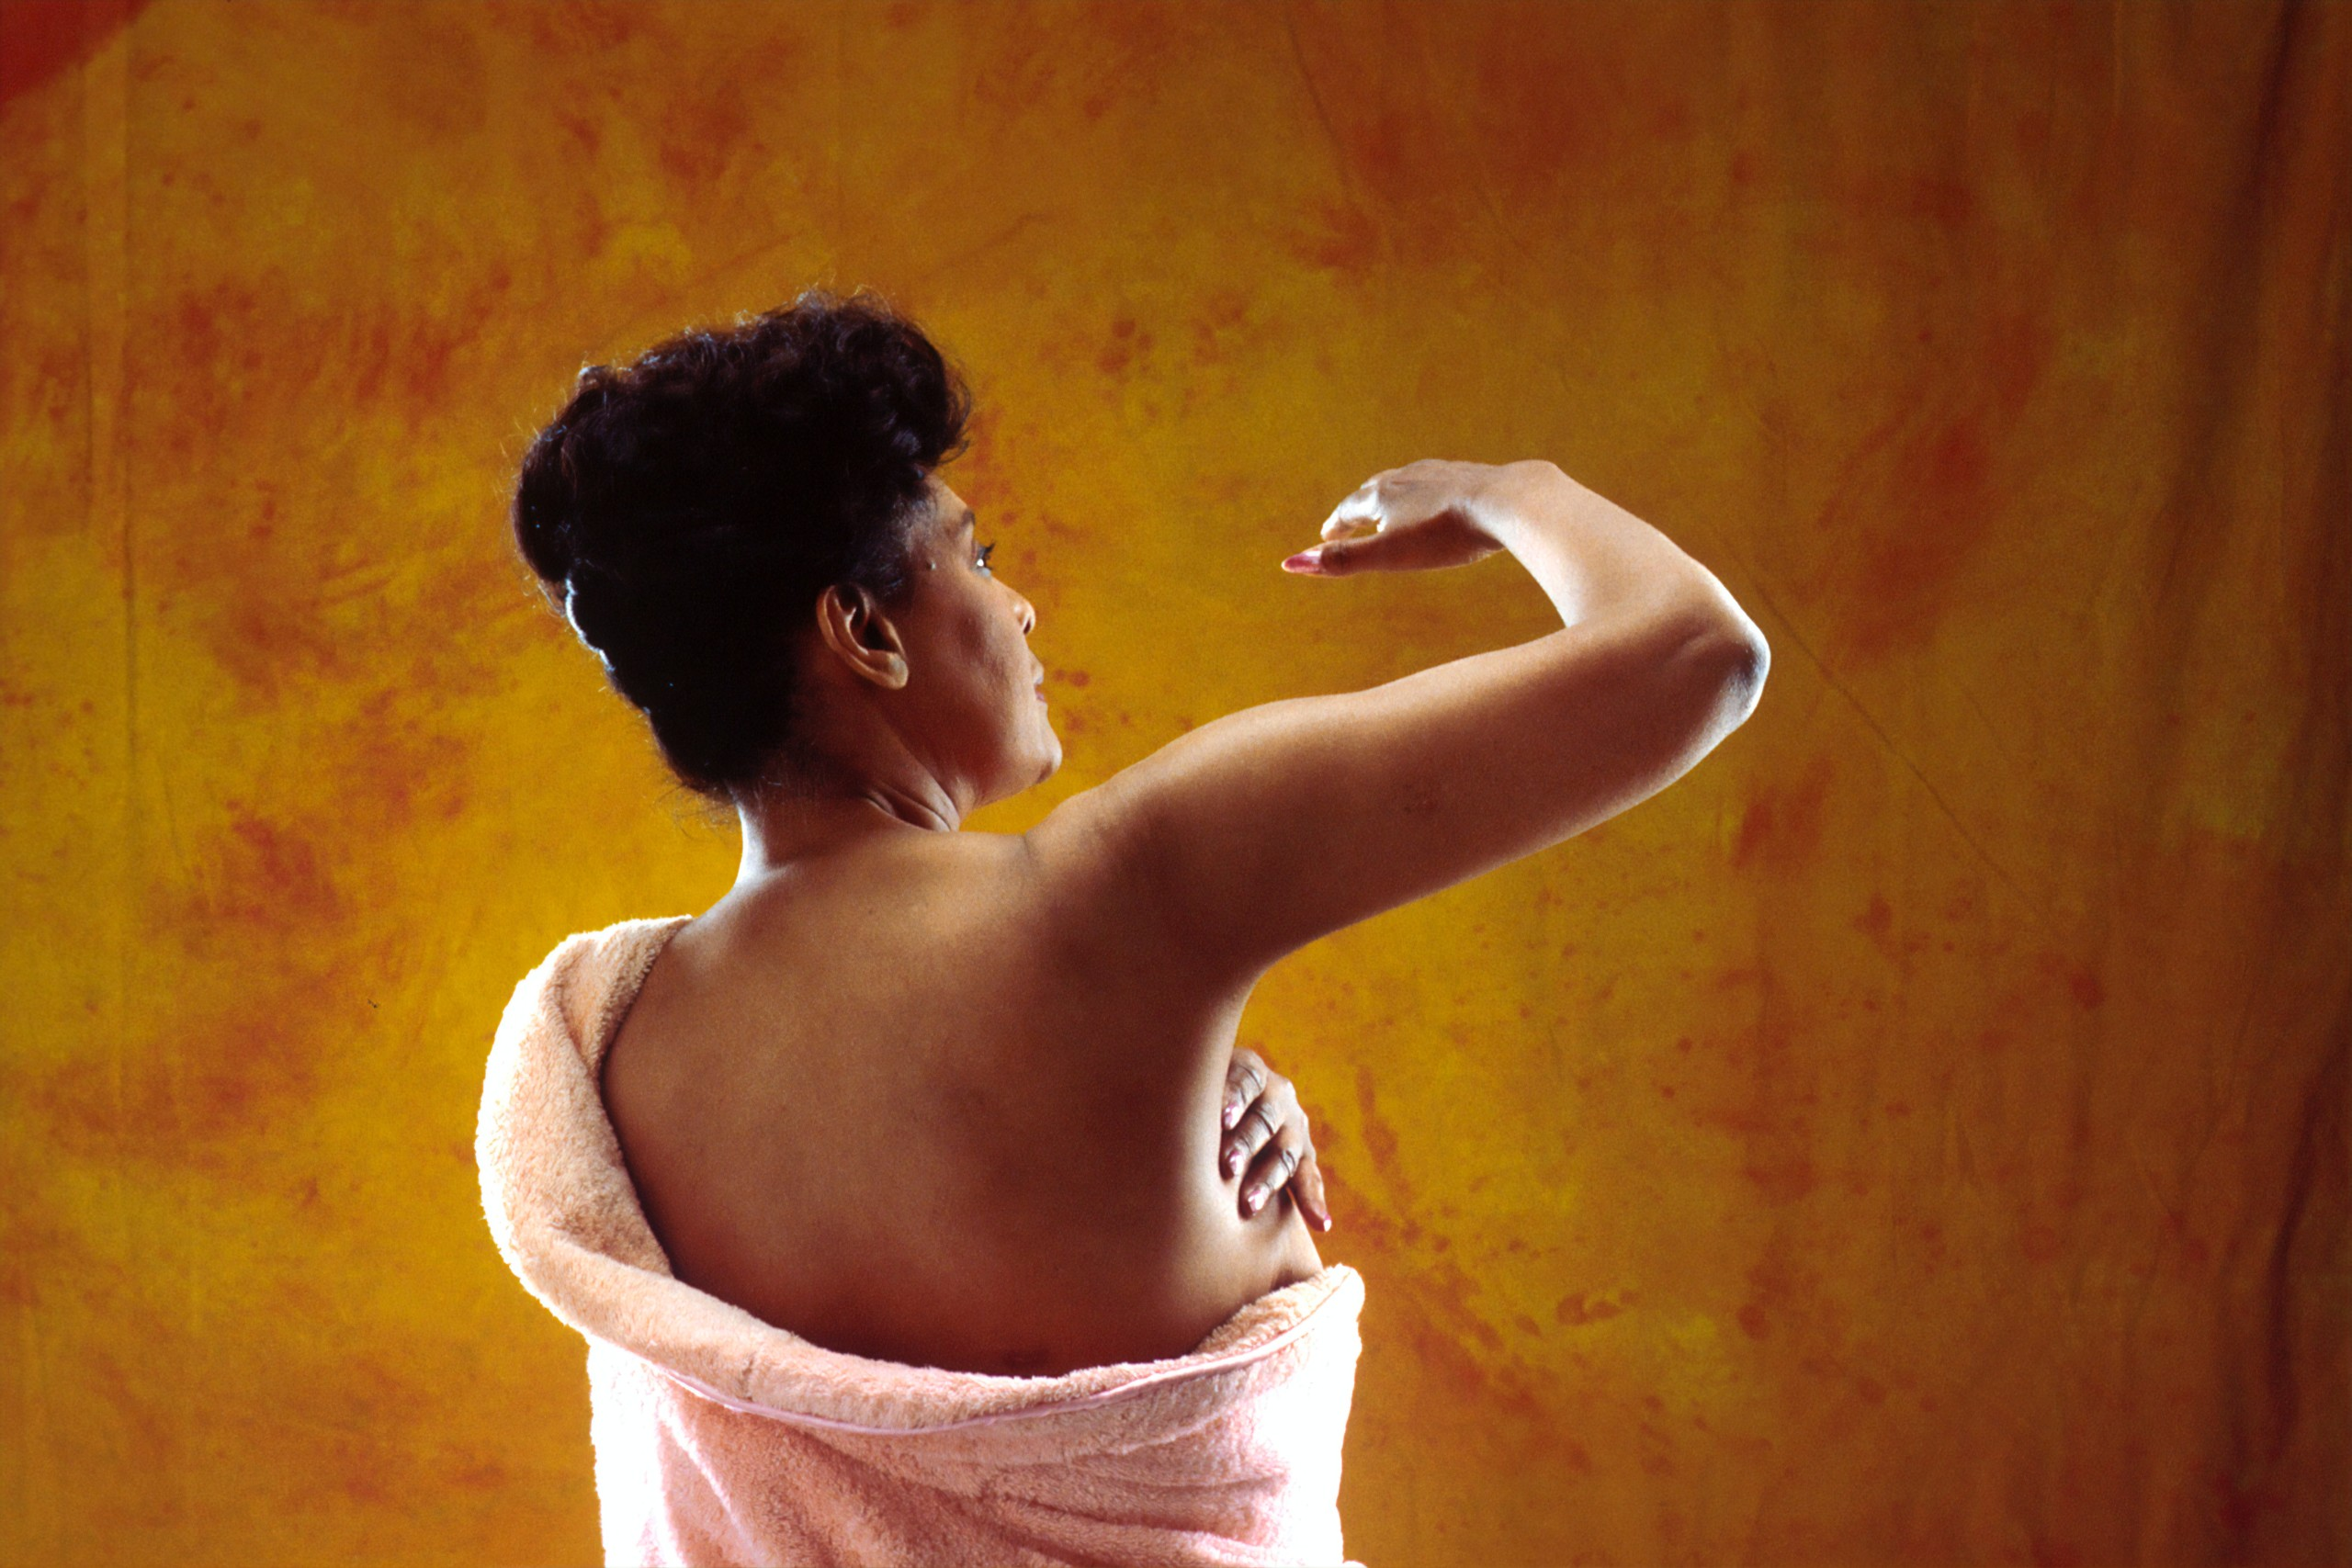 Rear-facing woman completes a breast self-examination